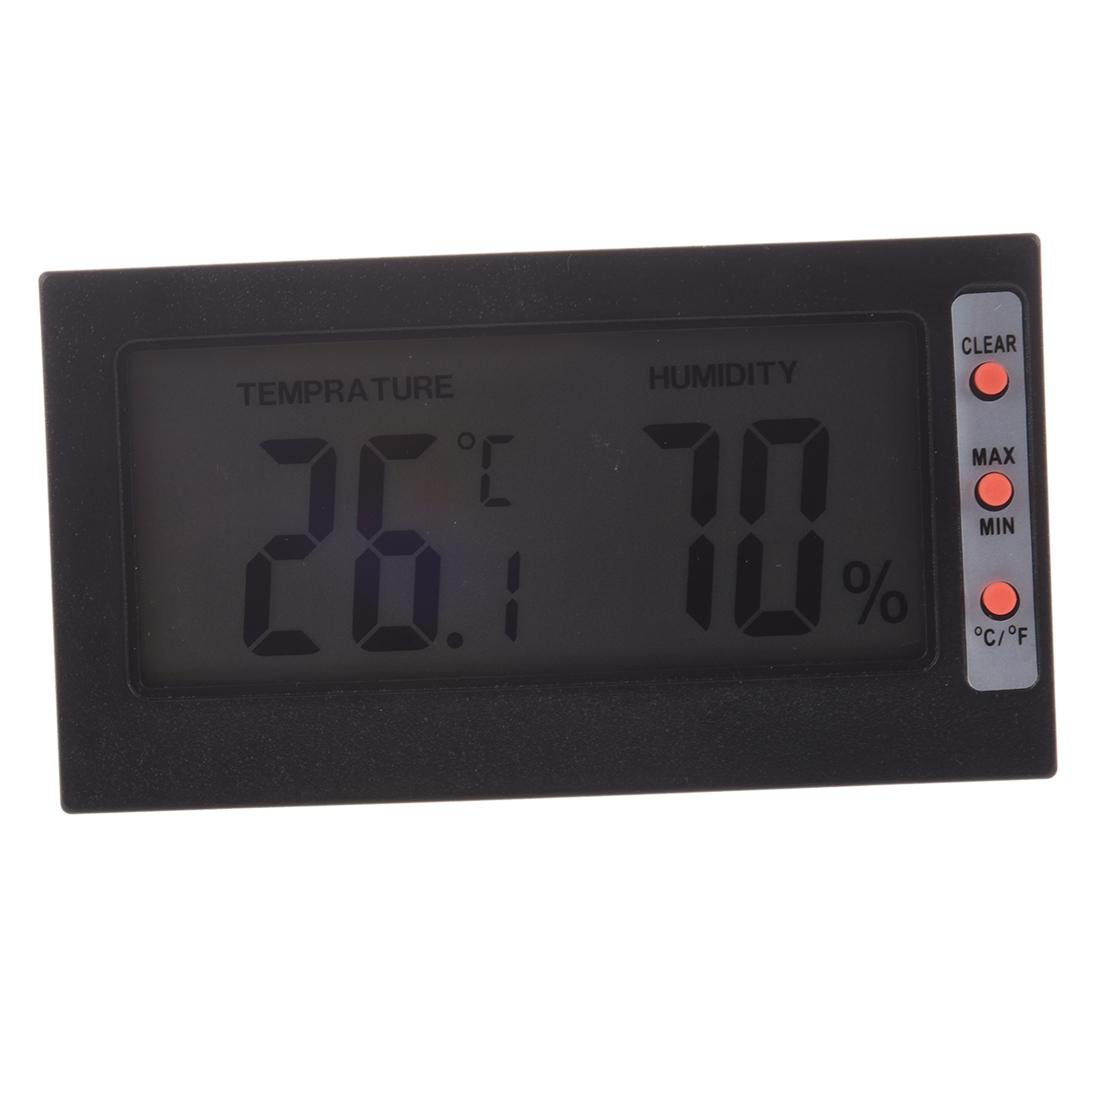 Digital Humidity Meter : Digital lcd dicplay thermometer hygrometer temperature